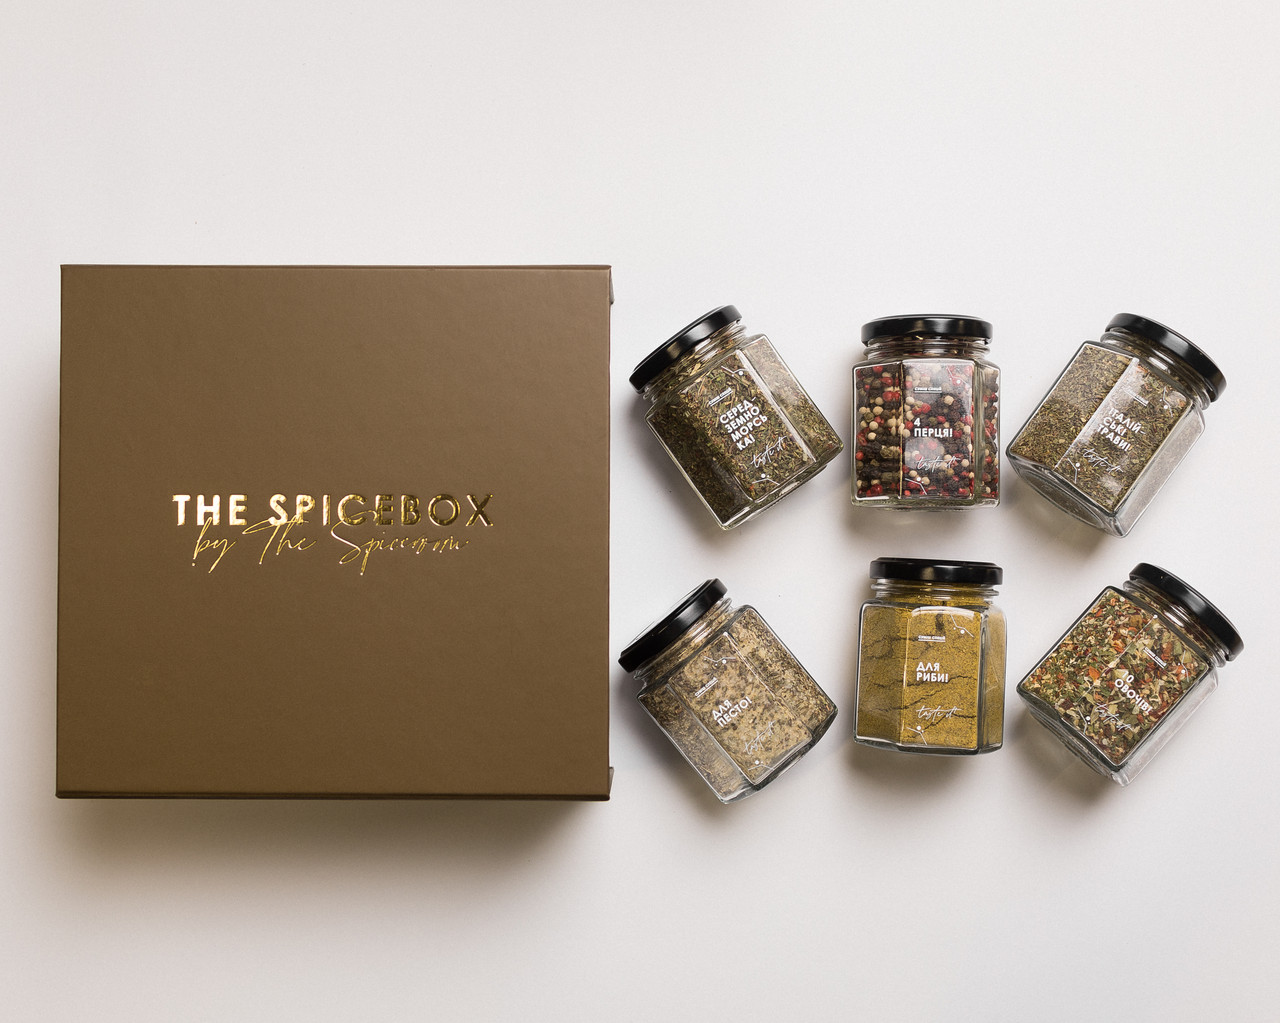 The Spicebox / Премиум Spice 2